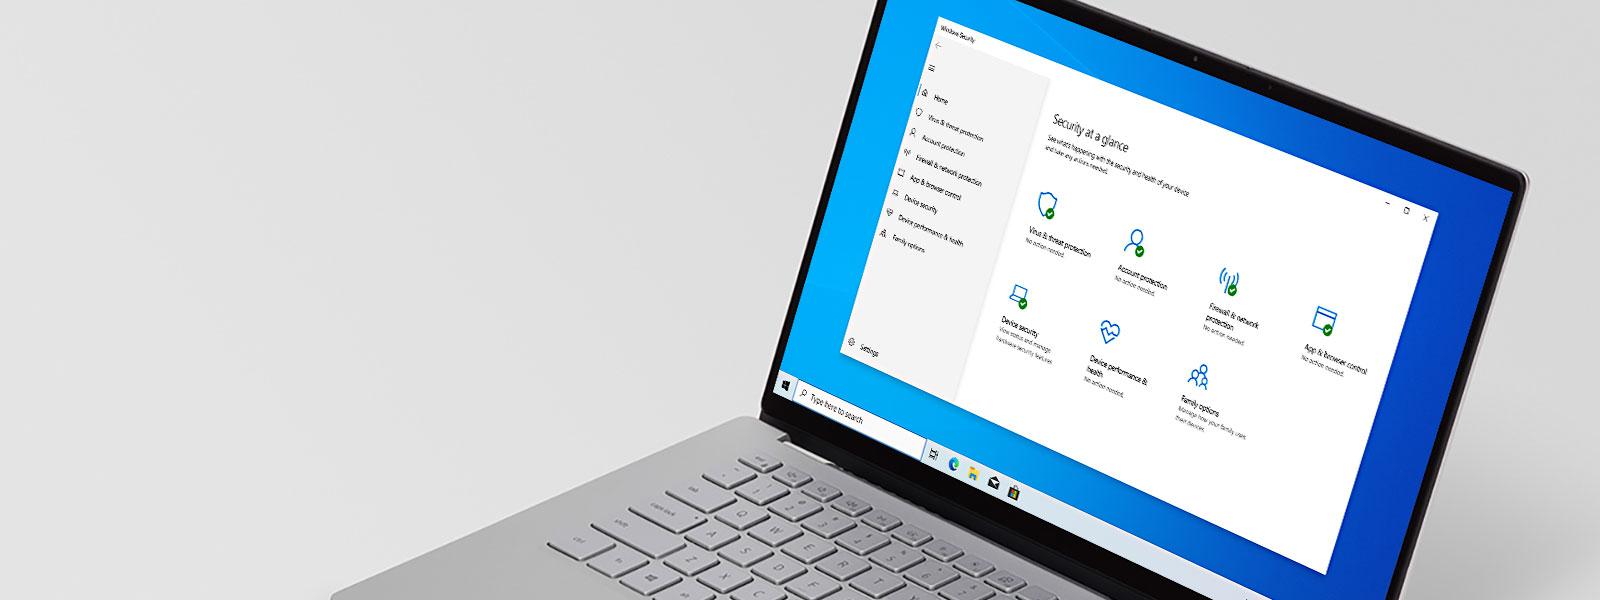 Windows 10 筆記型電腦顯示 Microsoft Defender 防毒軟體視窗